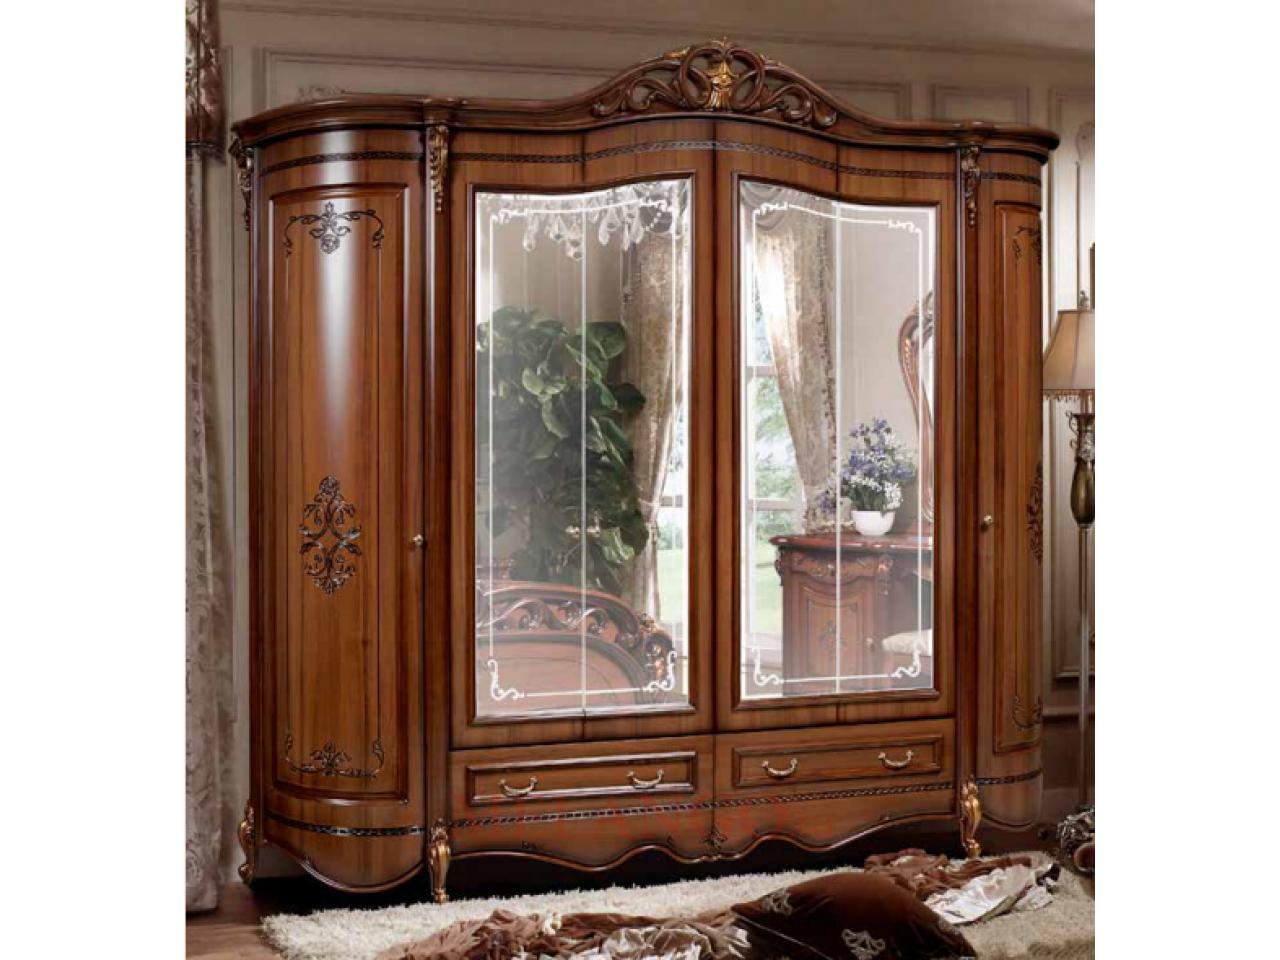 Шестистворчатый шкаф для одежды Аллегро (орех) РАСПРОДАЖА